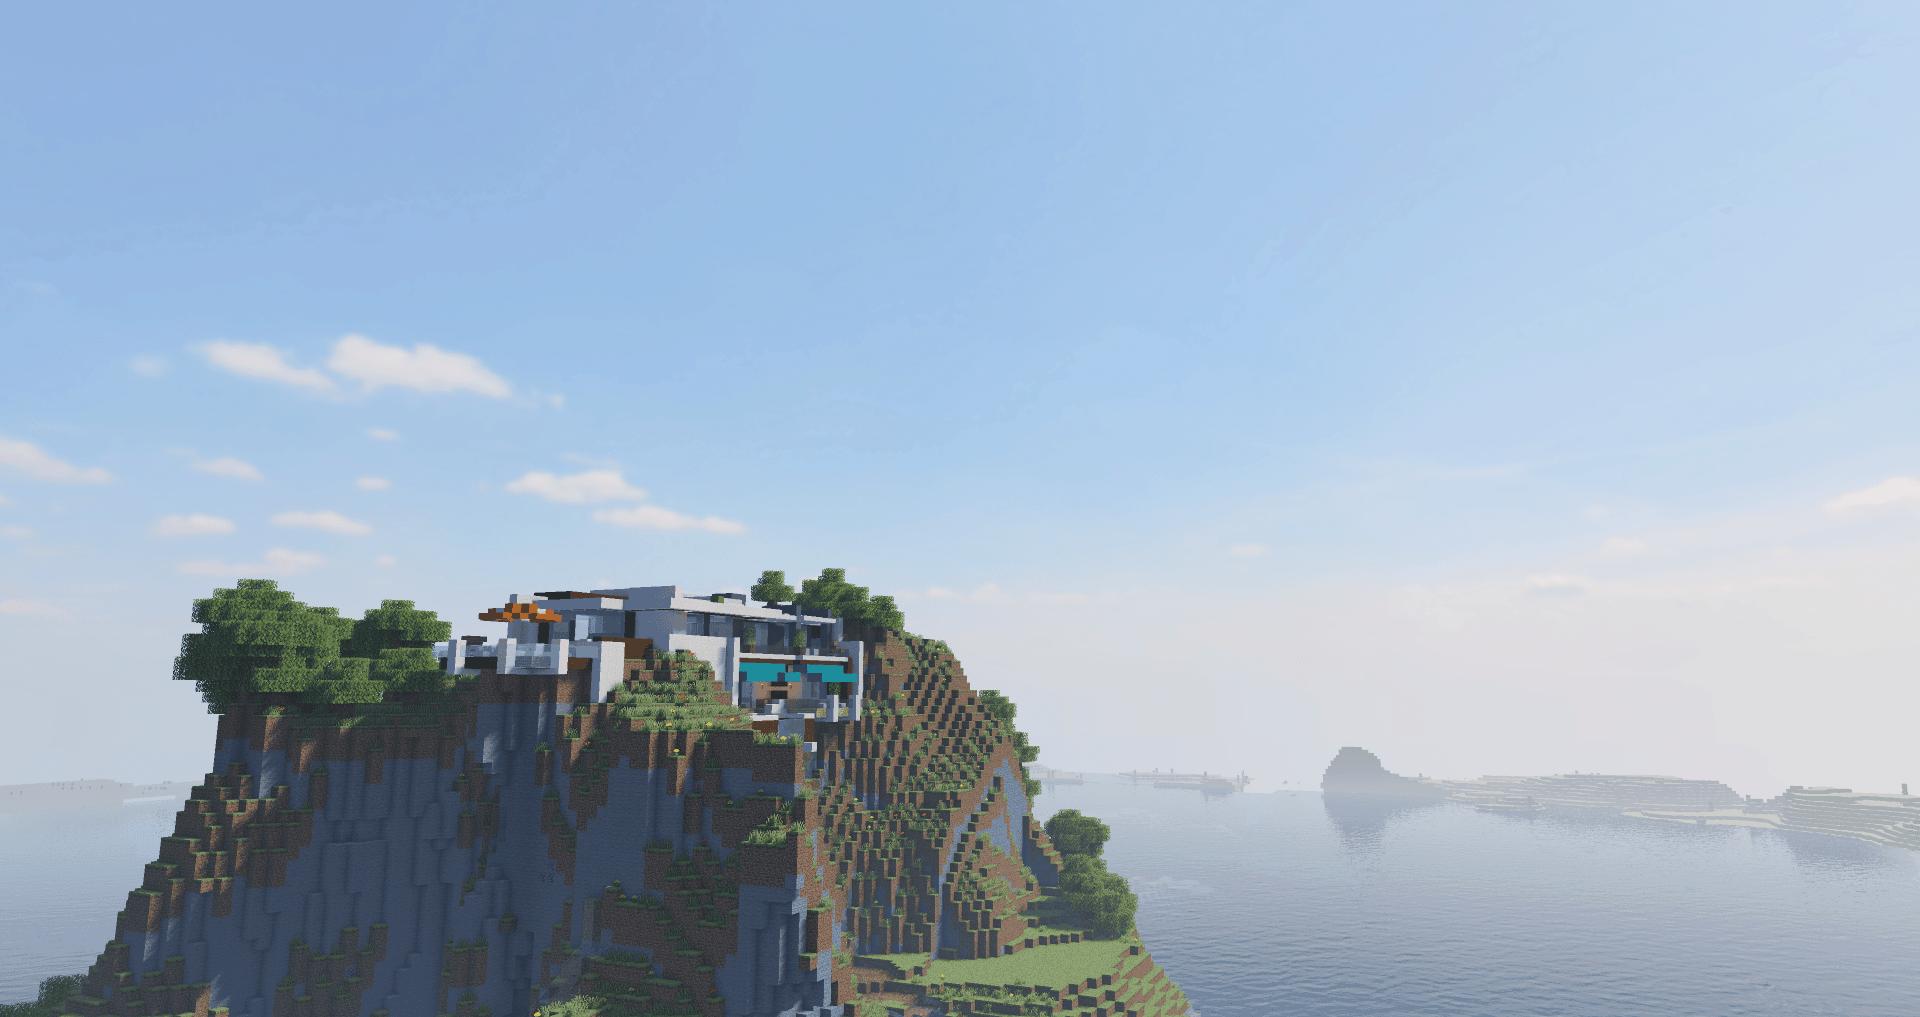 projectluma_ProjectLUMAShader:1.12.2-1.14.4|Minecraft-France